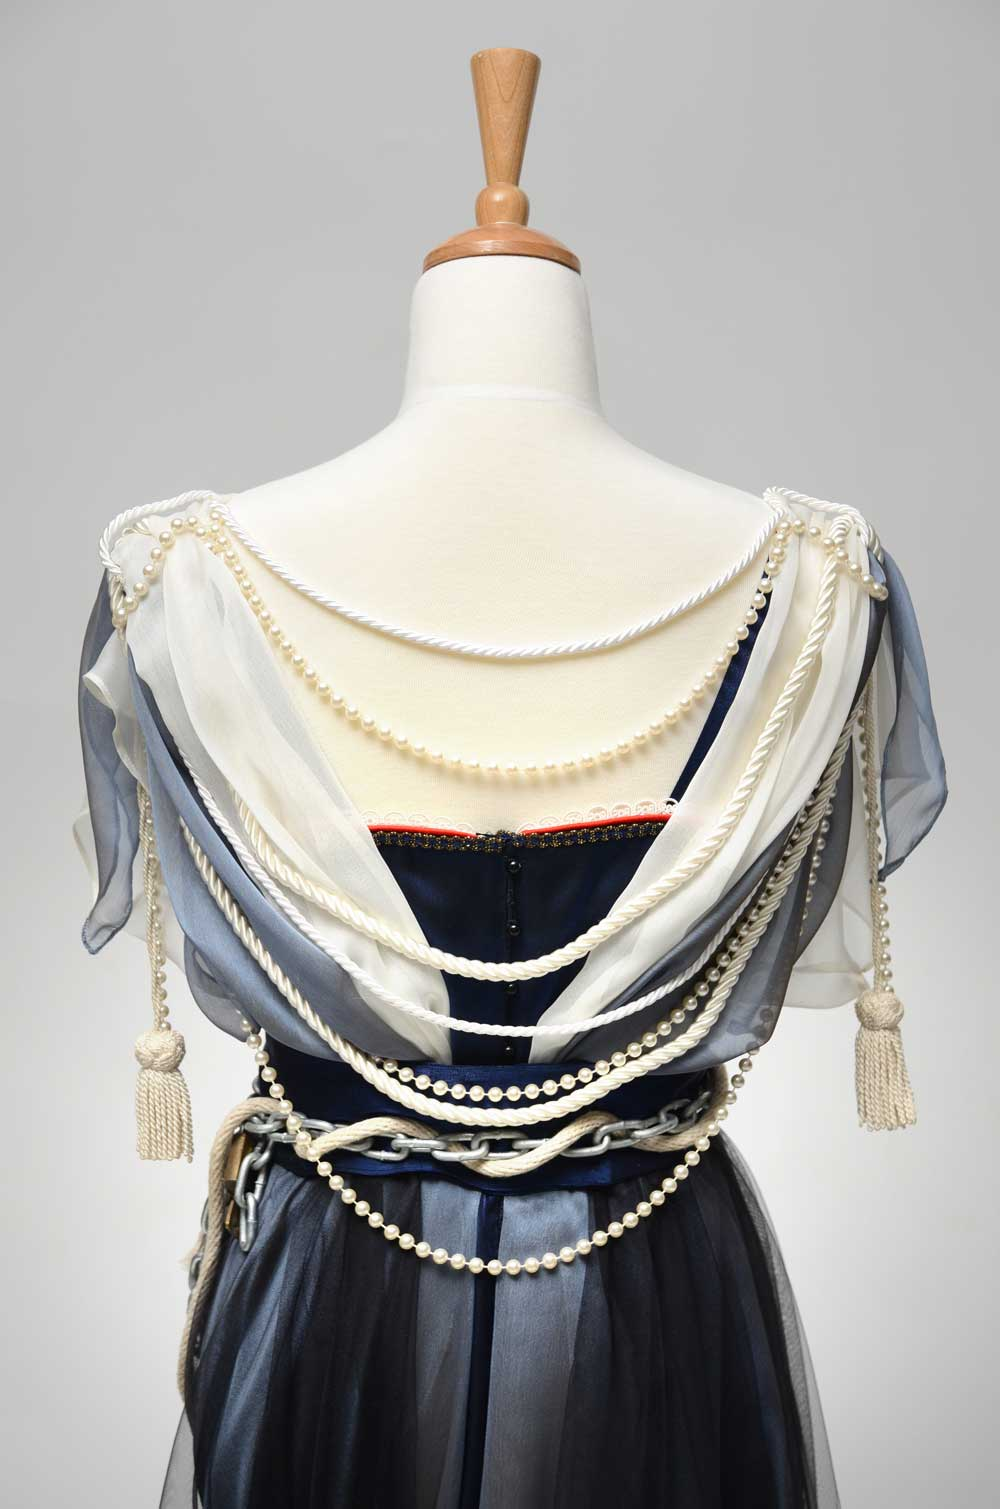 Julia-Spizzica-Design-Titanic-Dress